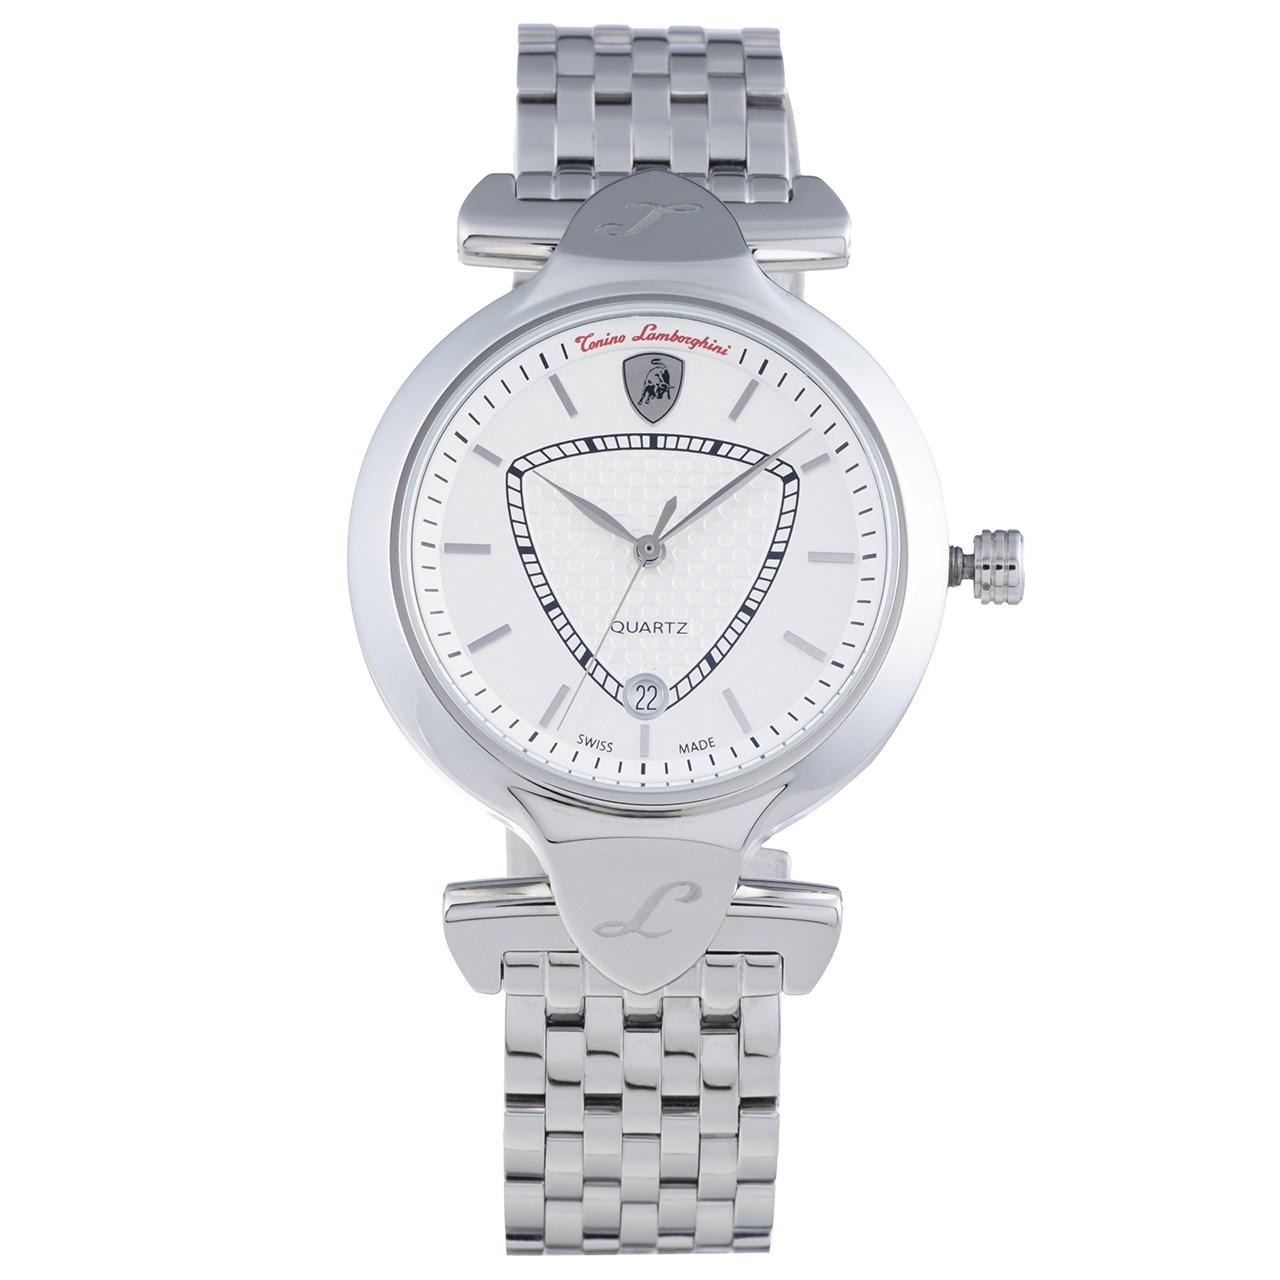 خرید ساعت مچی عقربه ای زنانه تونینو لامبورگینی مدل TL-LR38-01